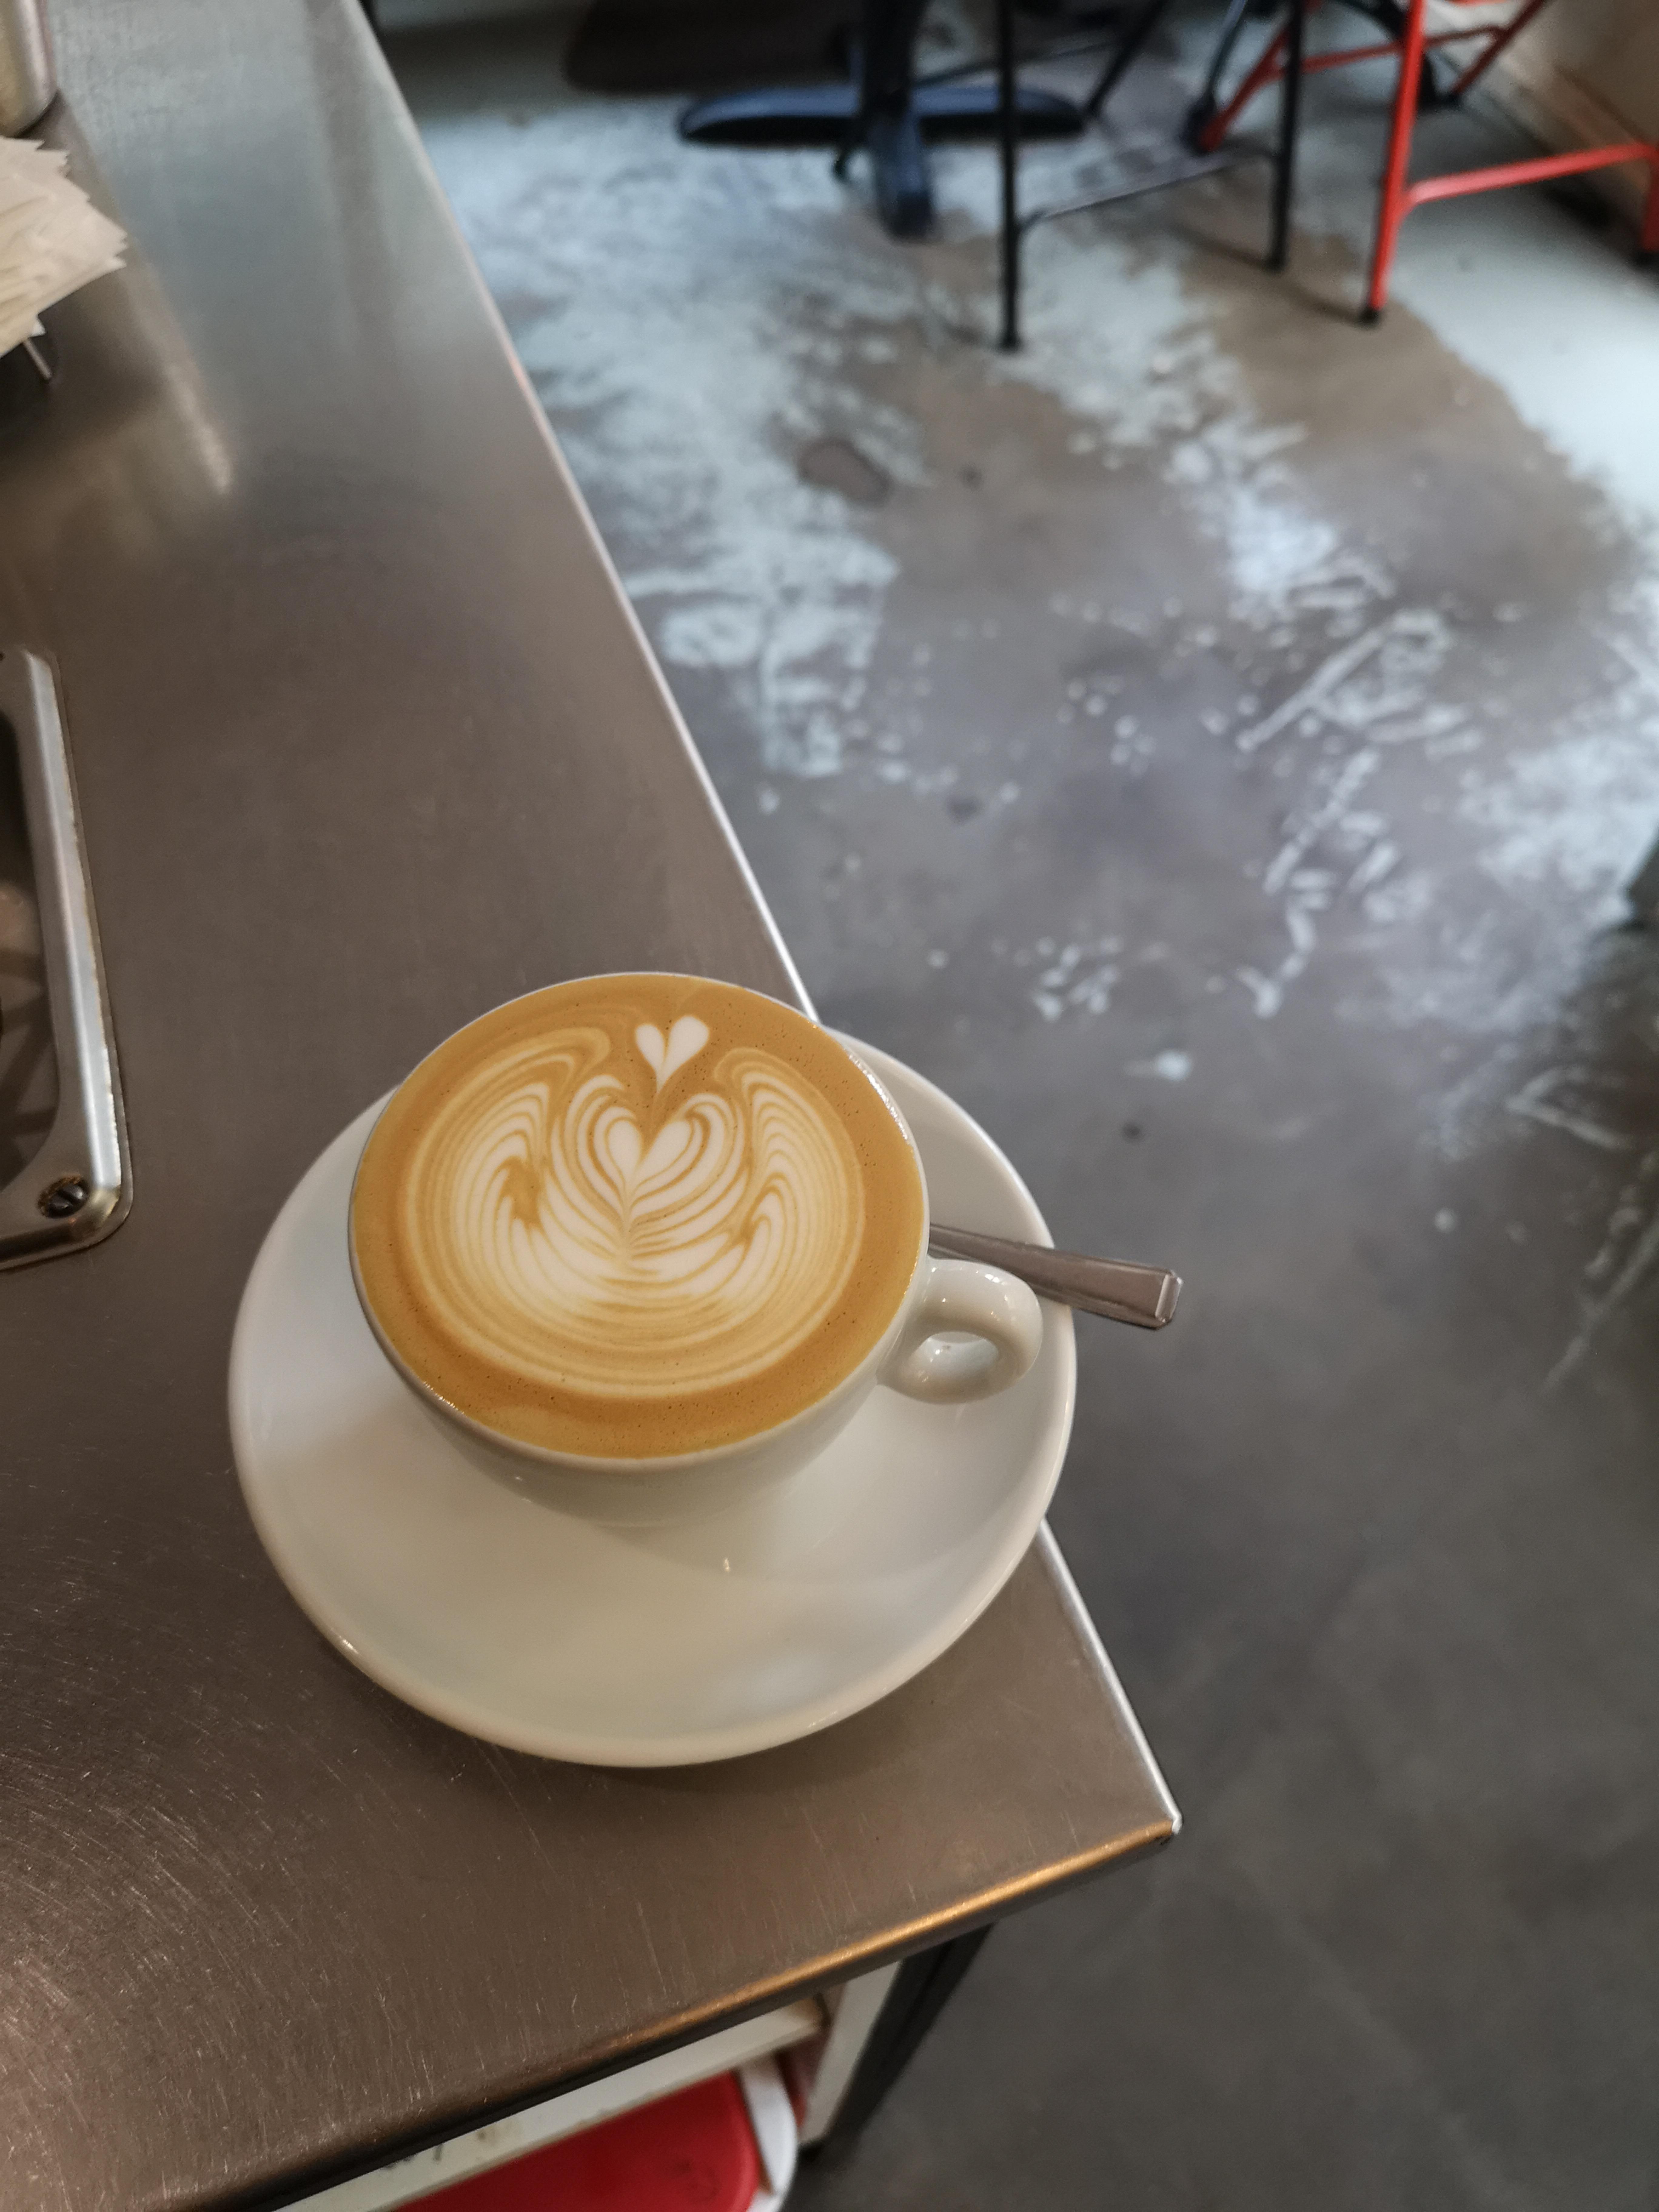 From Friday 6oz Coffee Cafe Espresso Photography Coffeeaddict Yummy Barista Coffee And Books Gourmet Coffee Fine Coffee